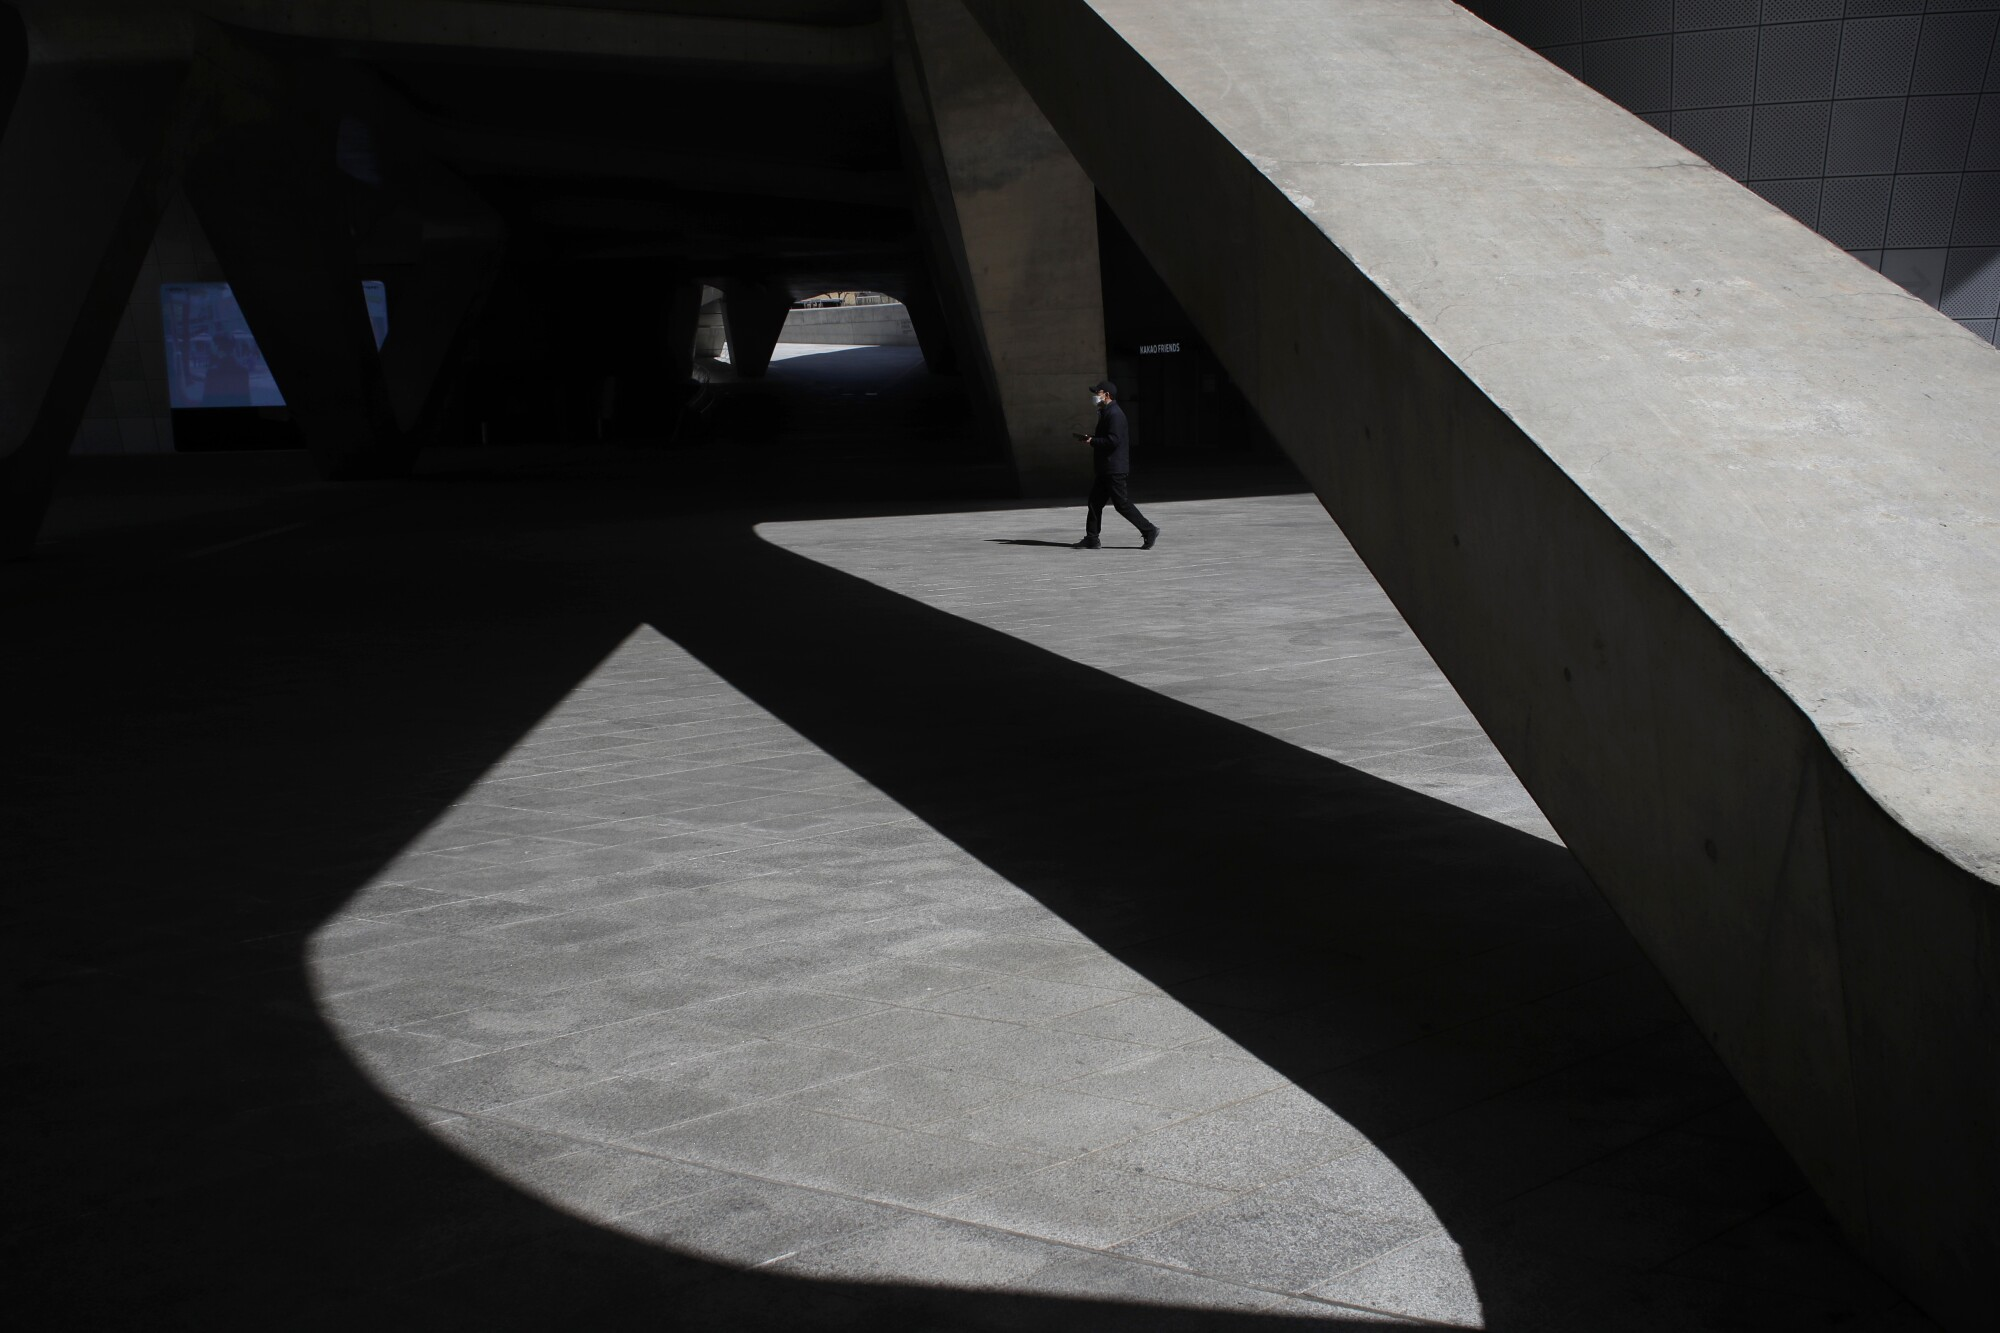 A man wearing a mask walks at Dongdaemun Design Plaza in Seoul.